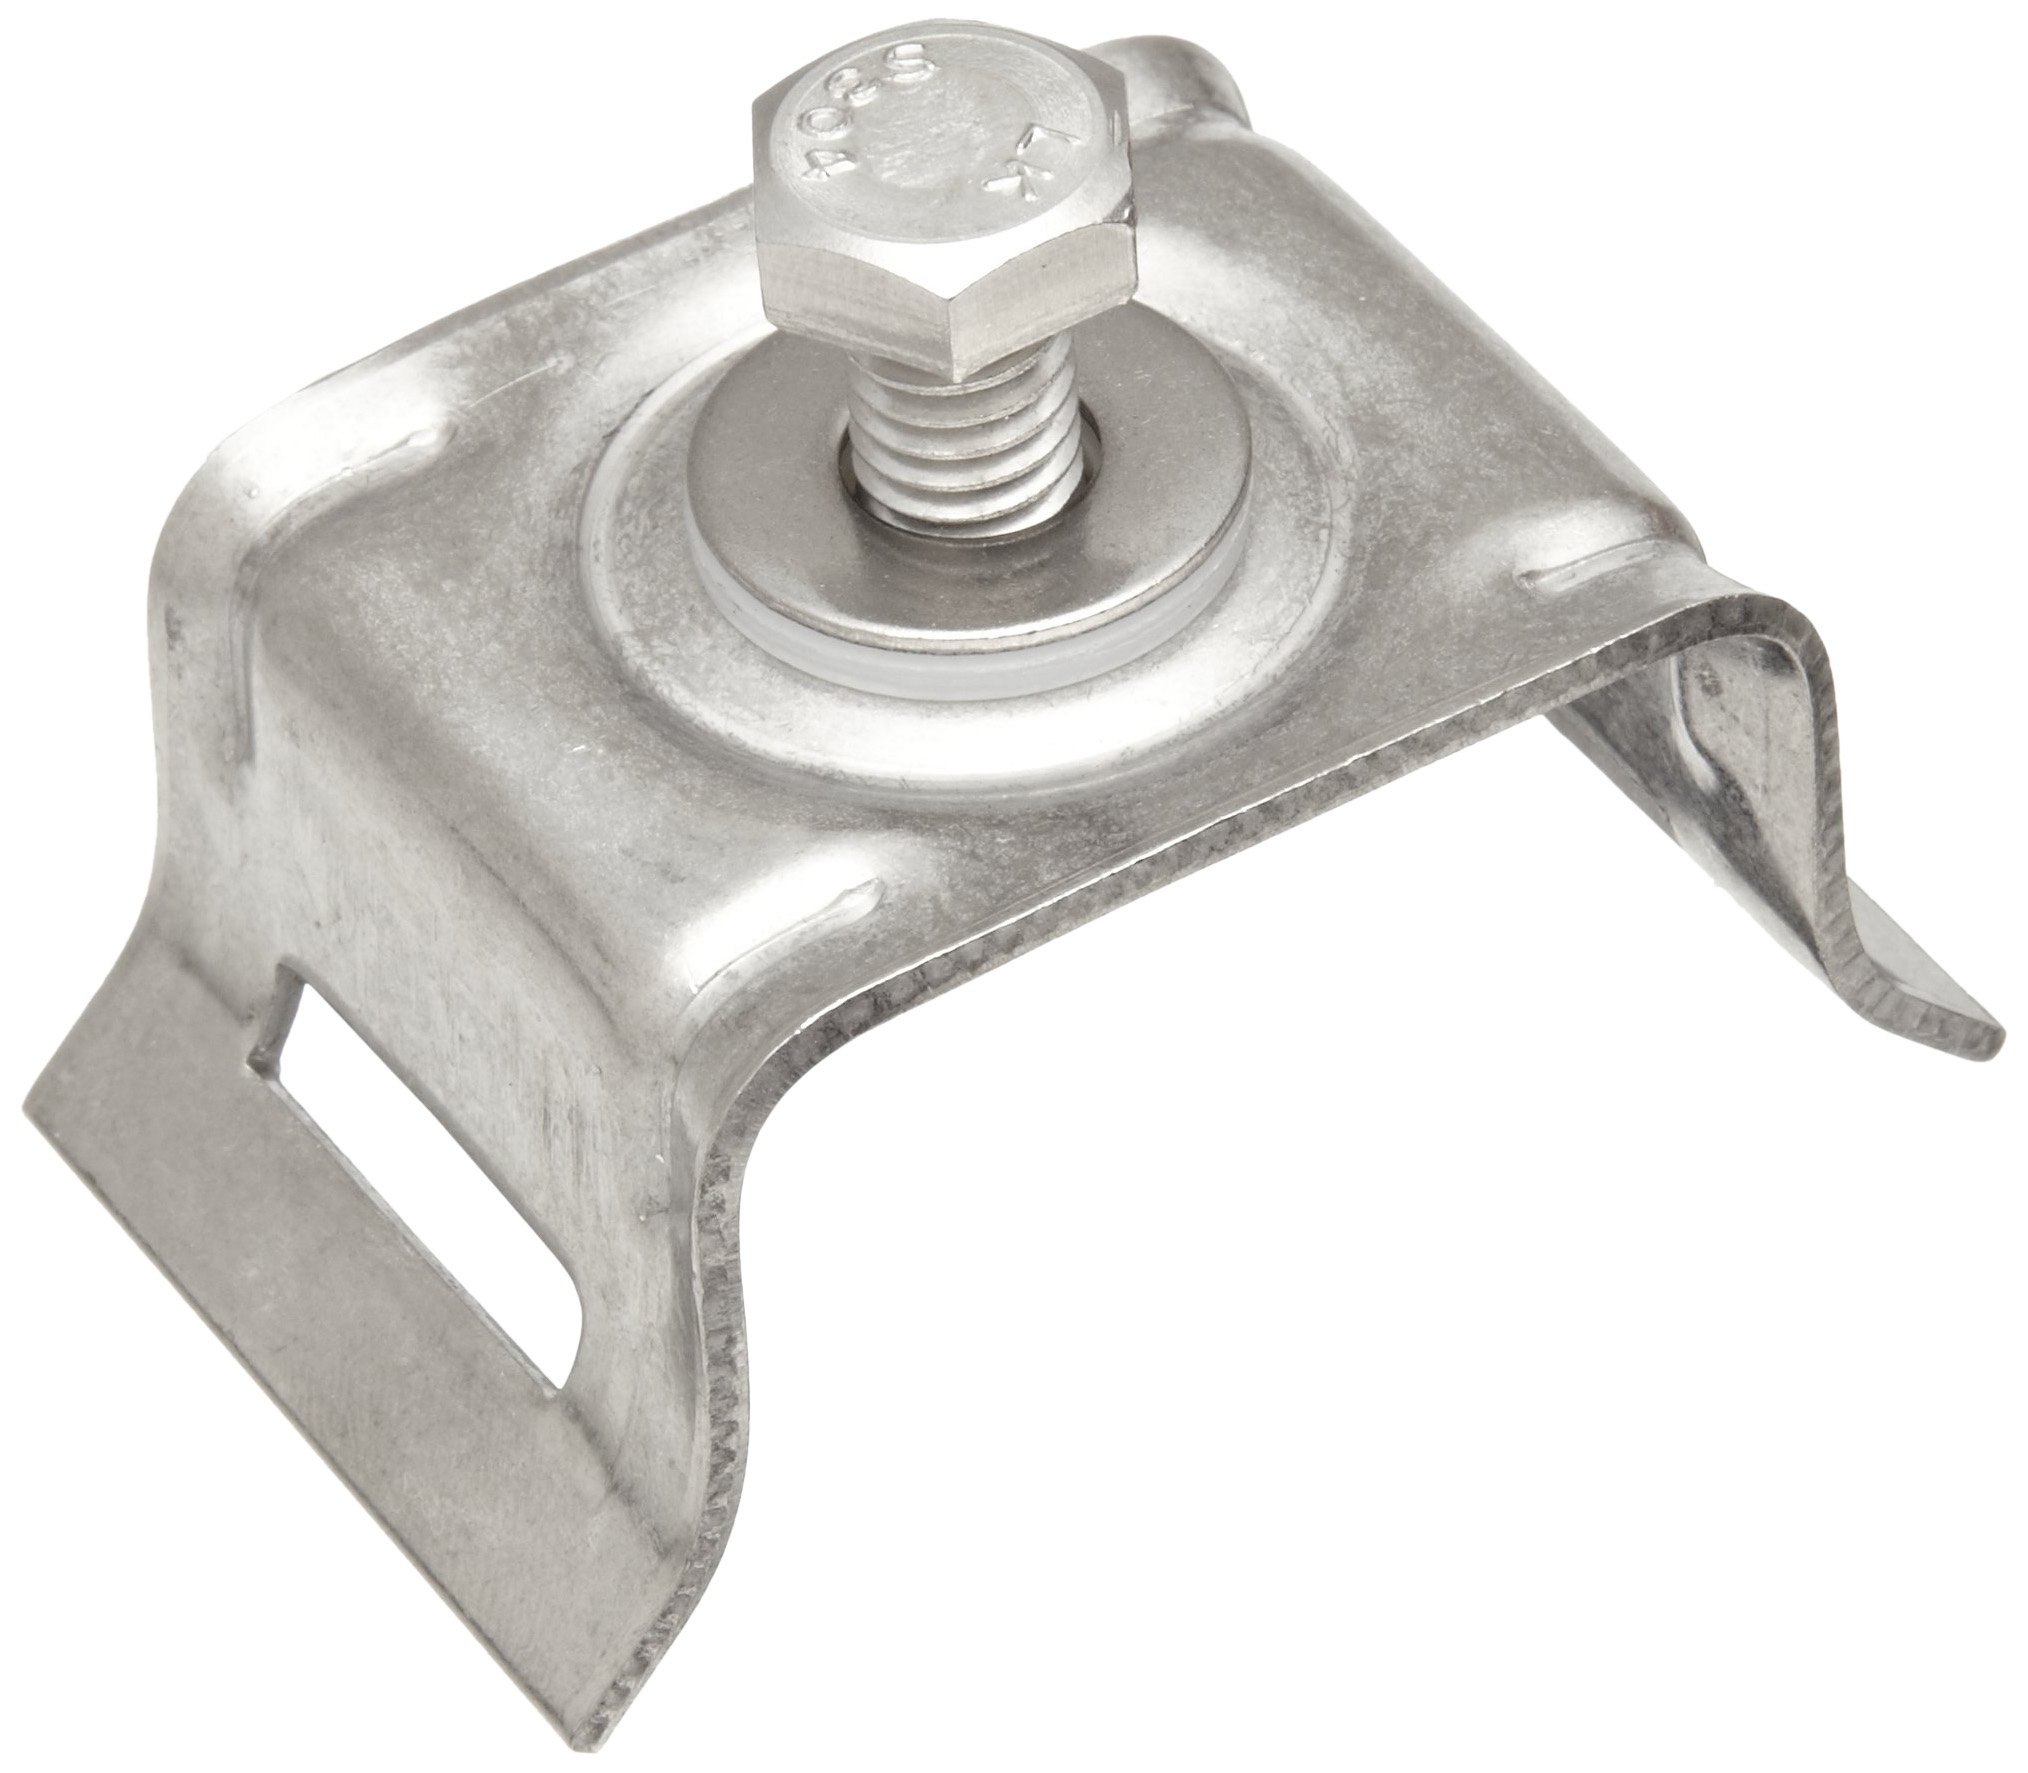 BAND-IT D02189 3/4'' Slot, 200/300 Stainless Steel Flared Leg Single Bolt Brack-It (50 Per Box)